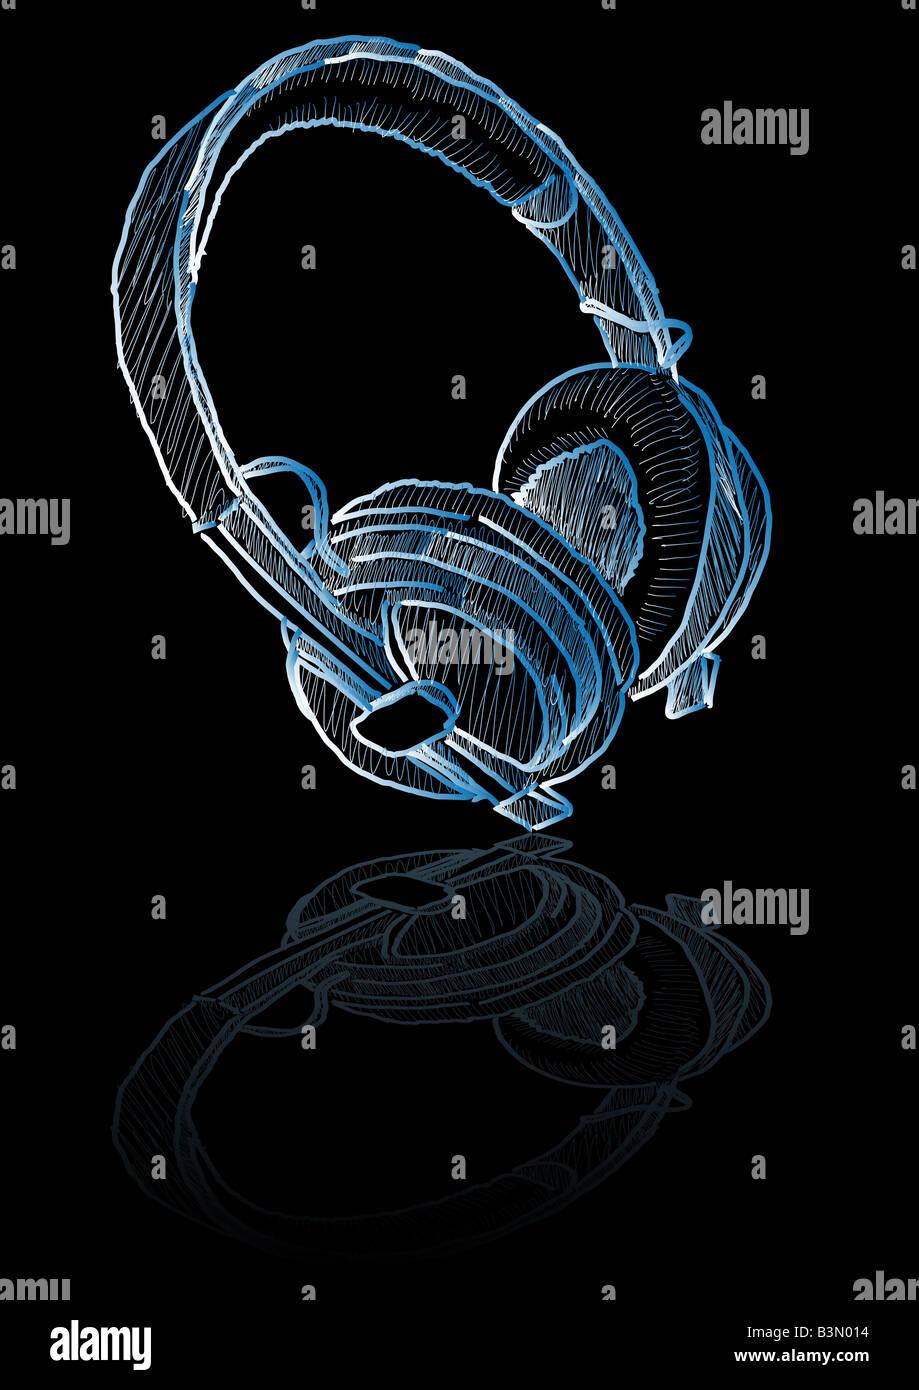 Vector abstracto dibujo a lápiz de un par de auriculares Imagen De Stock